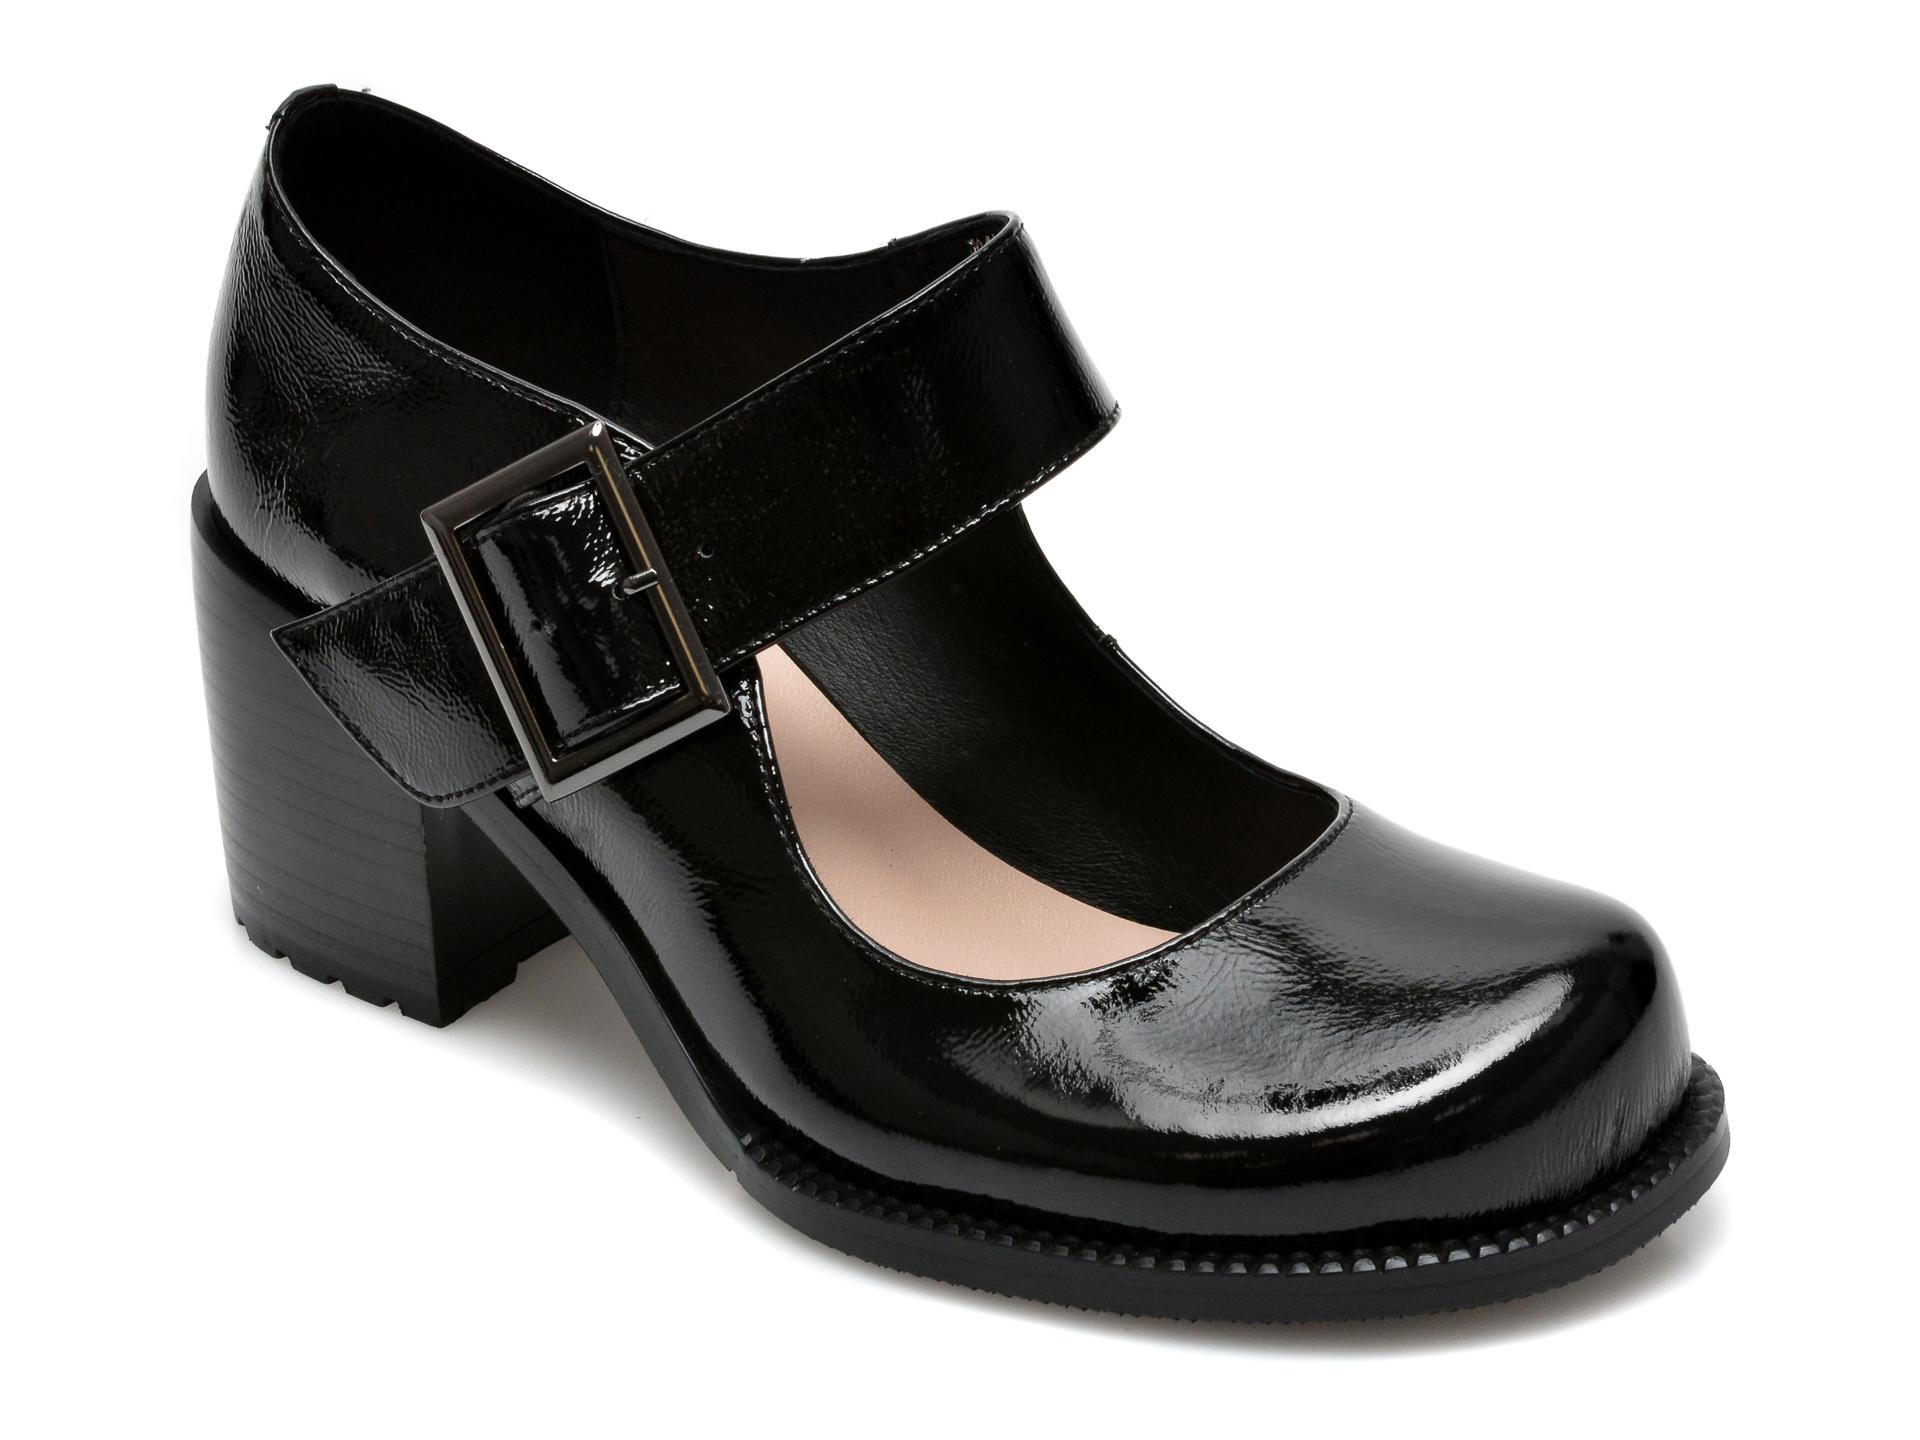 Pantofi FLAVIA PASSINI negri, H2118, din piele naturala lacuita imagine otter.ro 2021